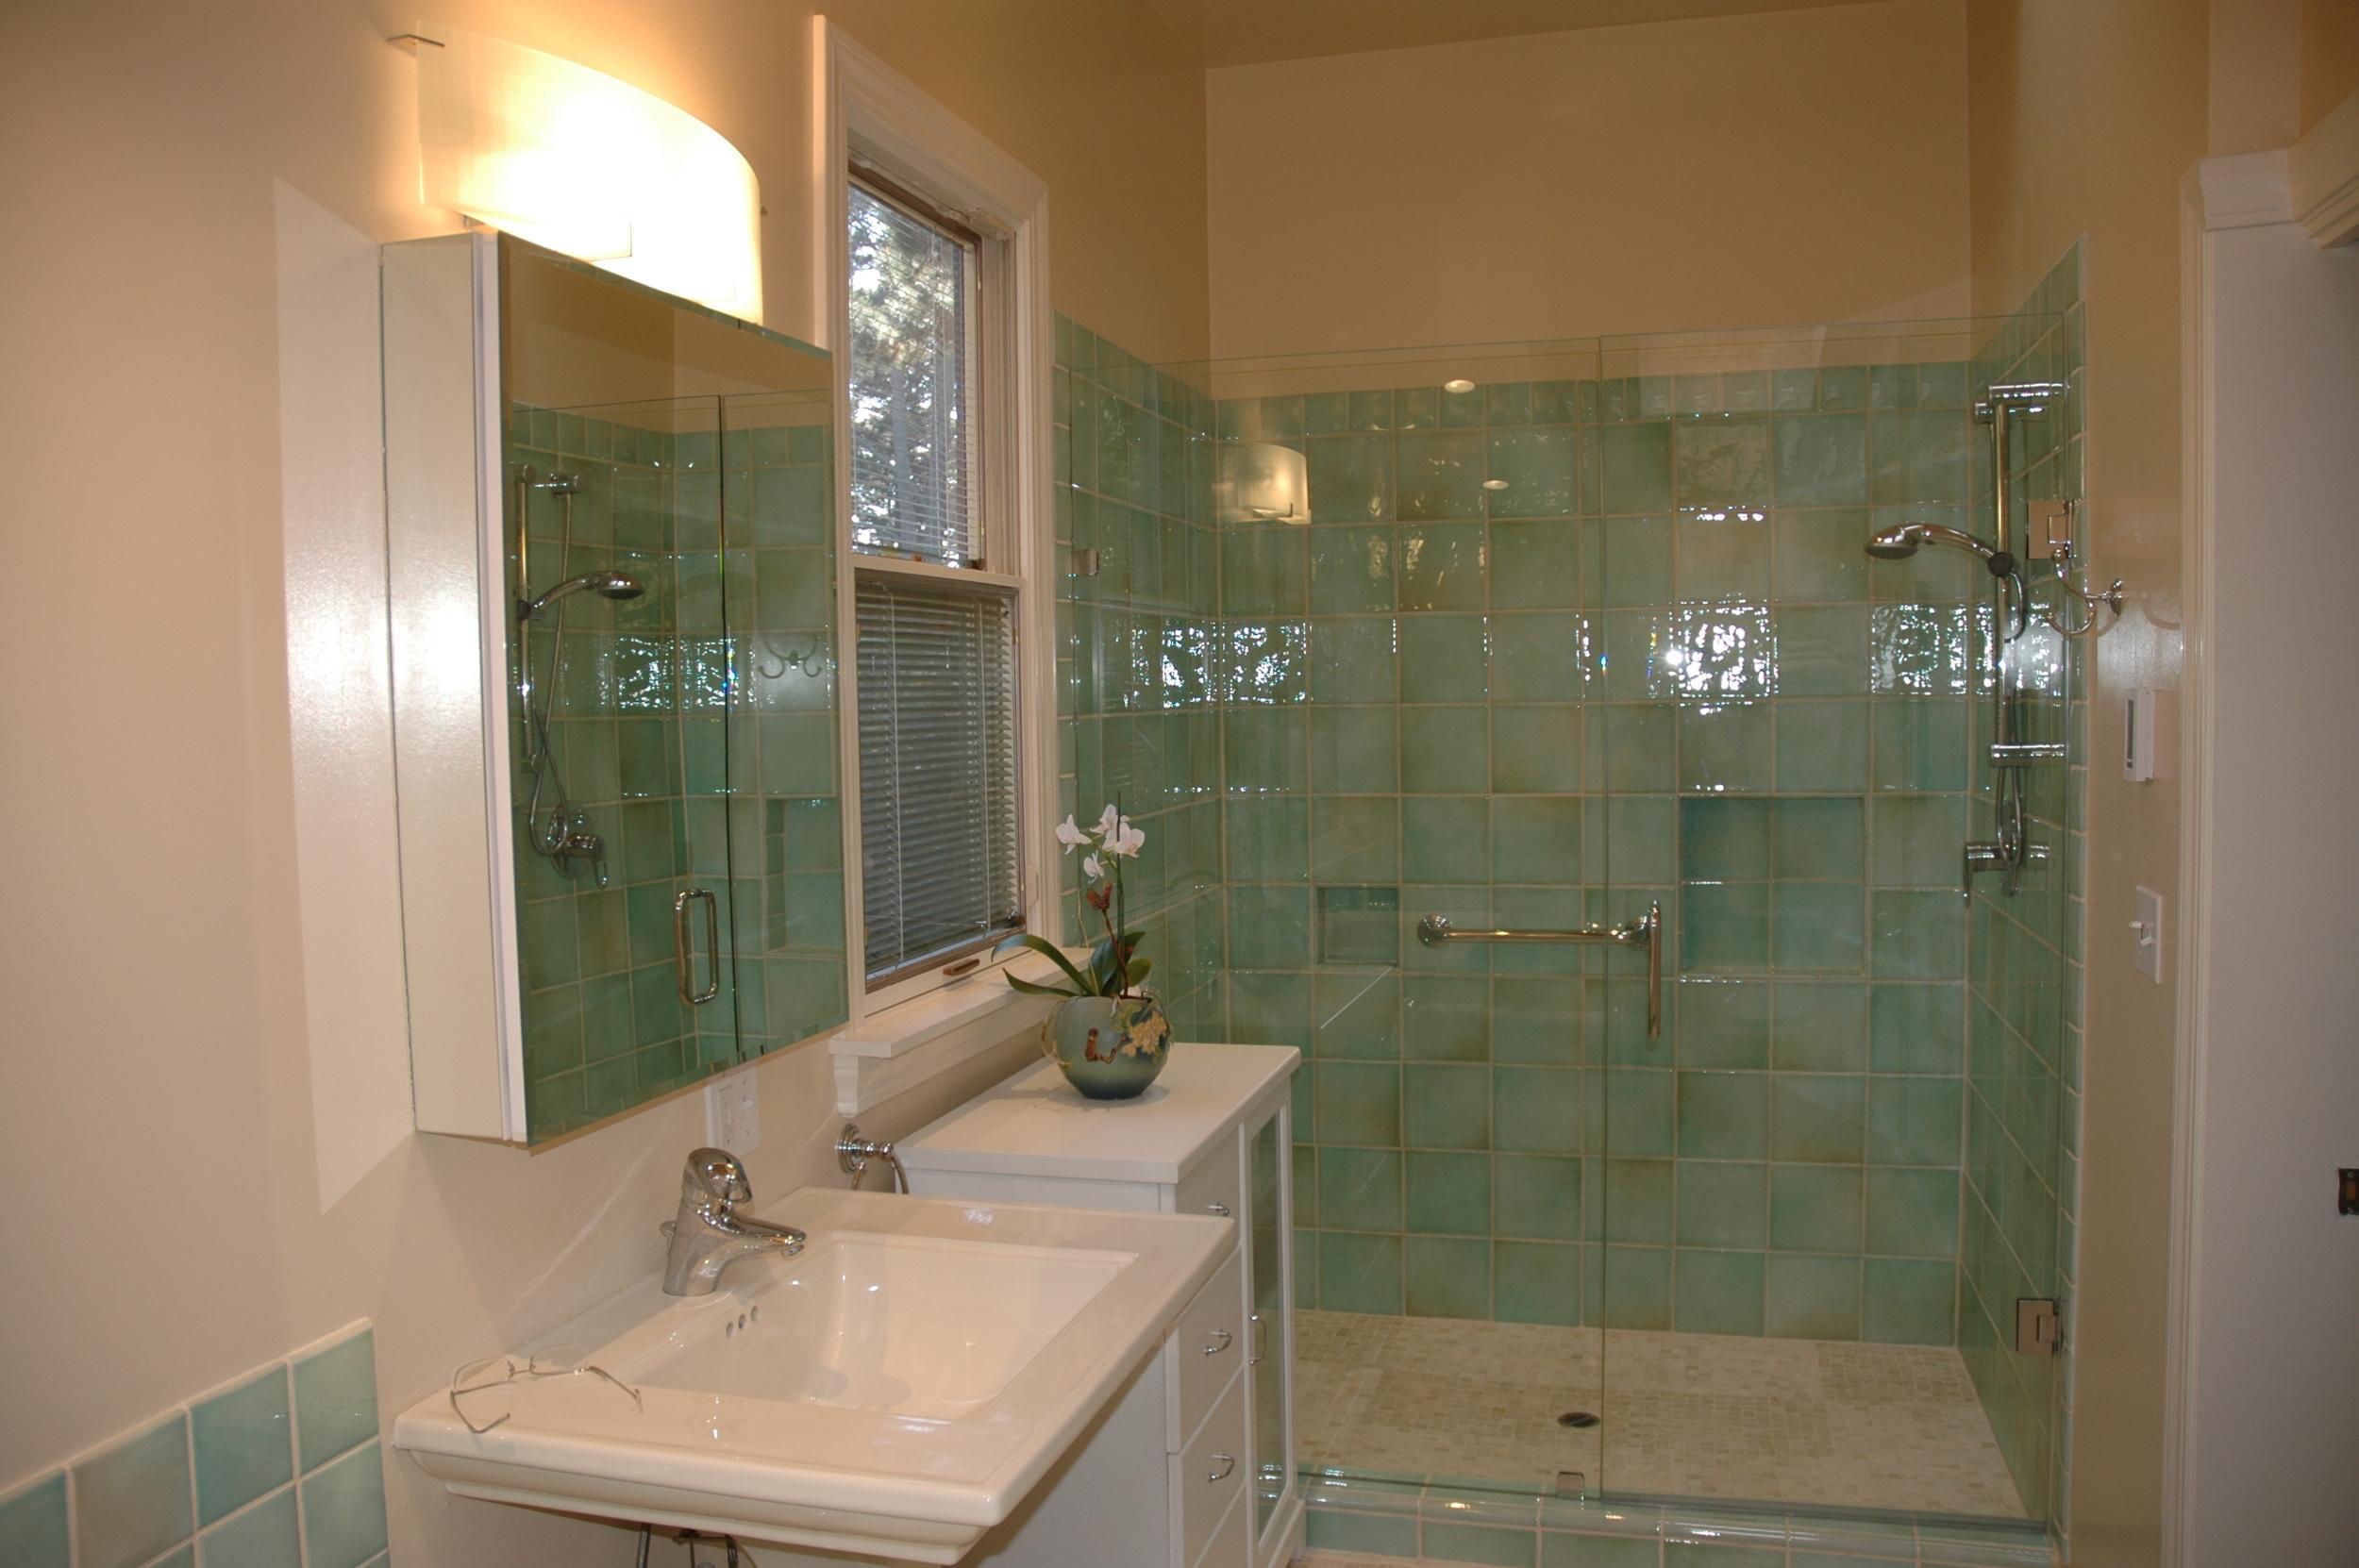 green-tile-bathroom.JPG